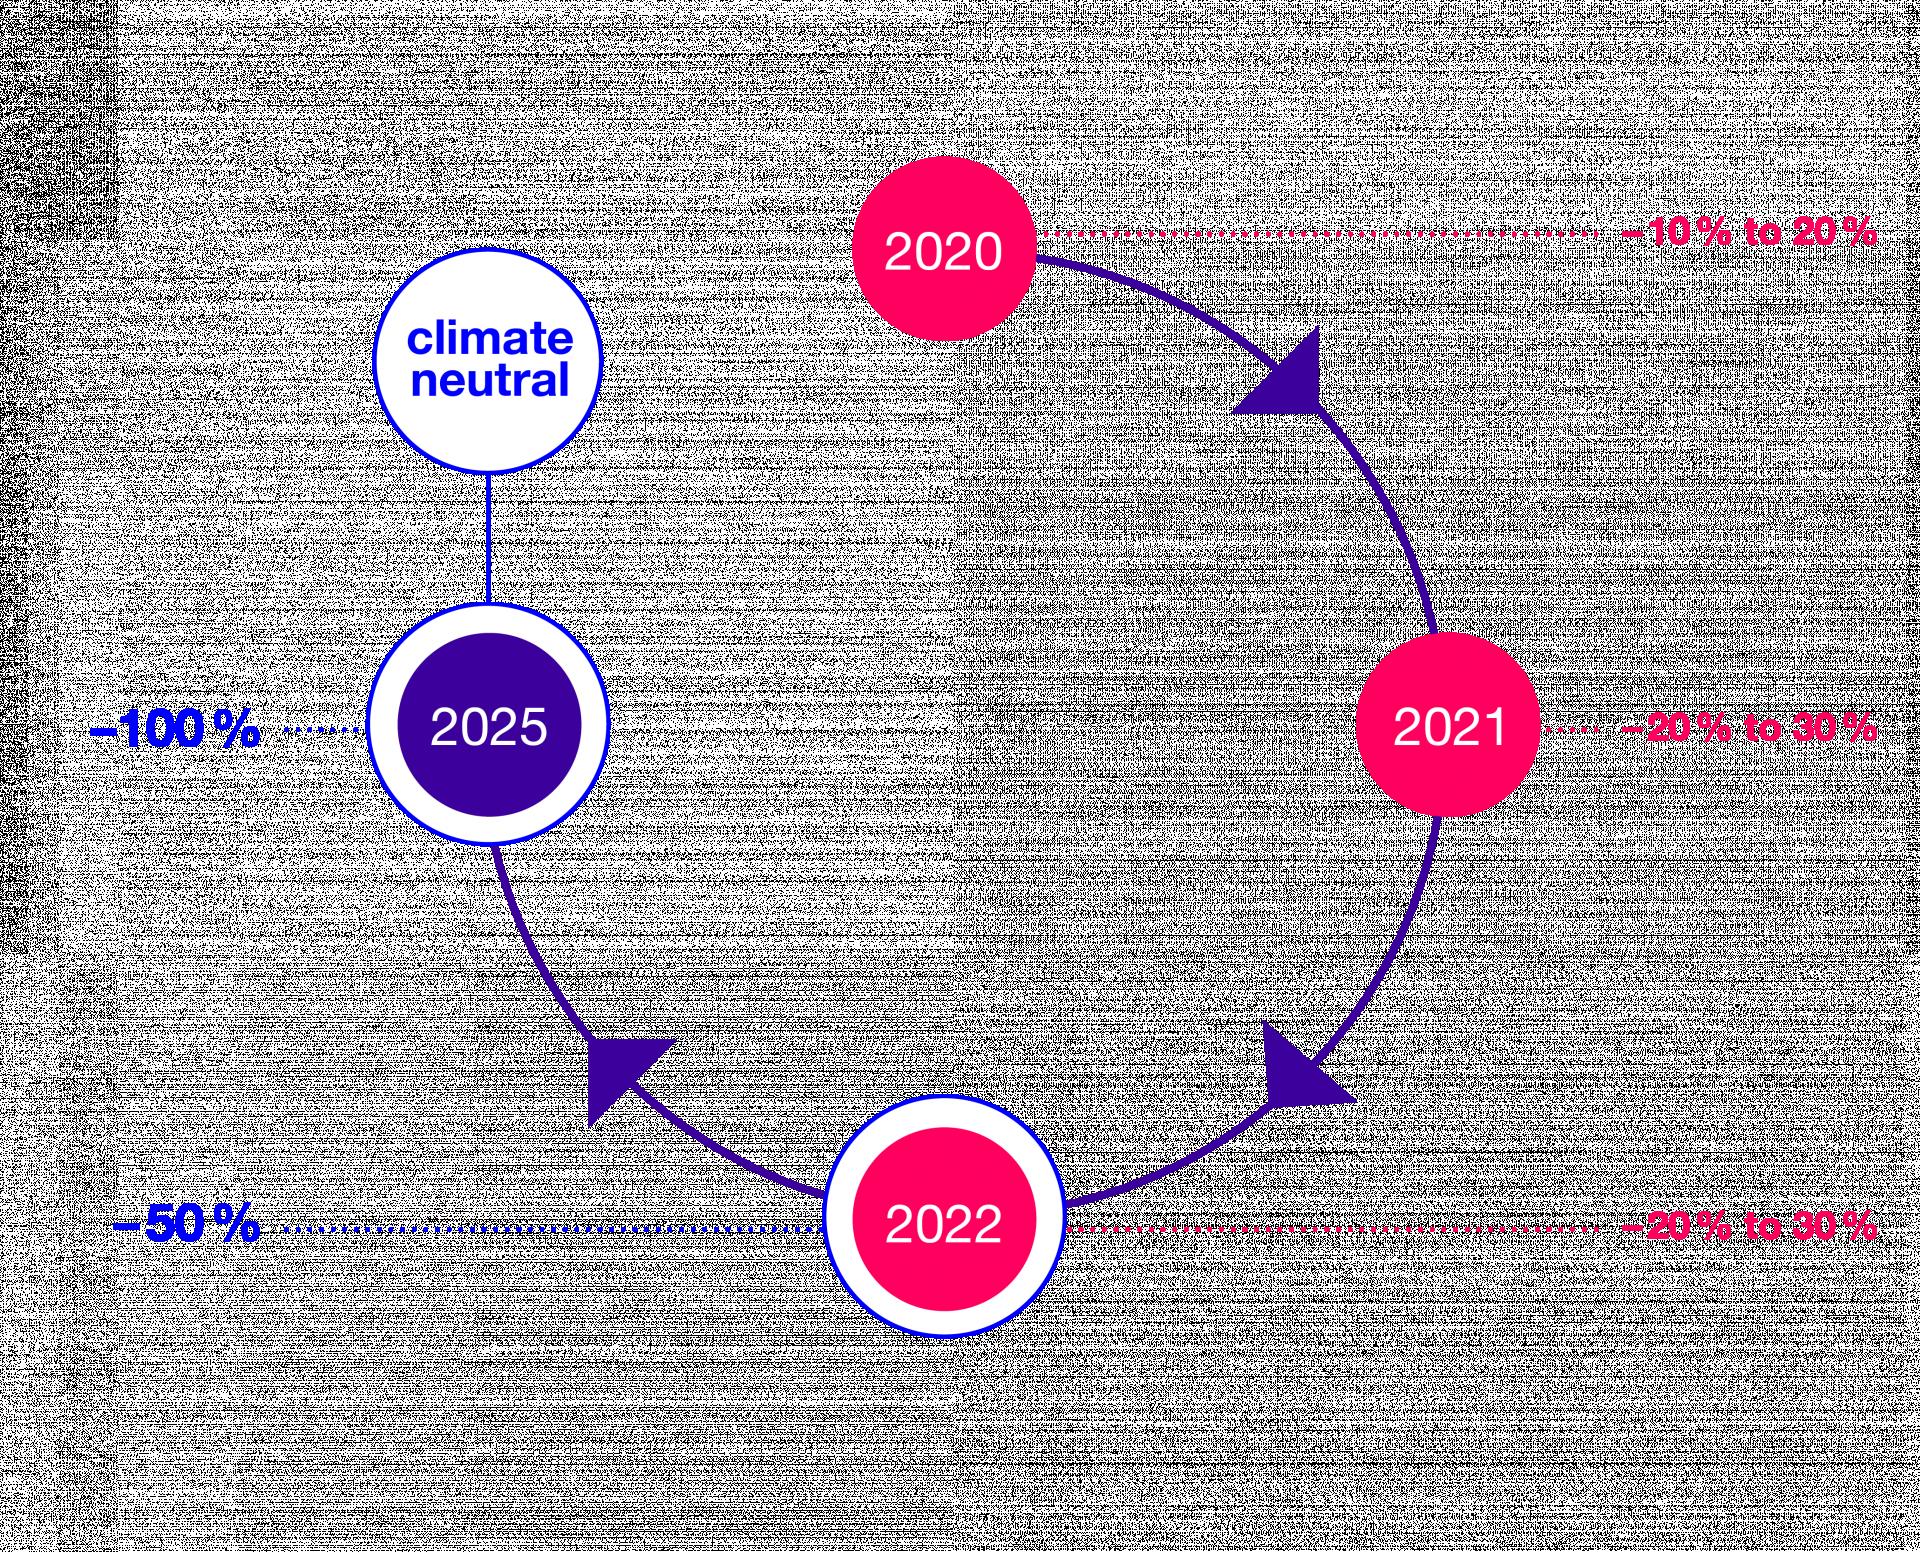 fischerAppelt Goals 2020 to 2025